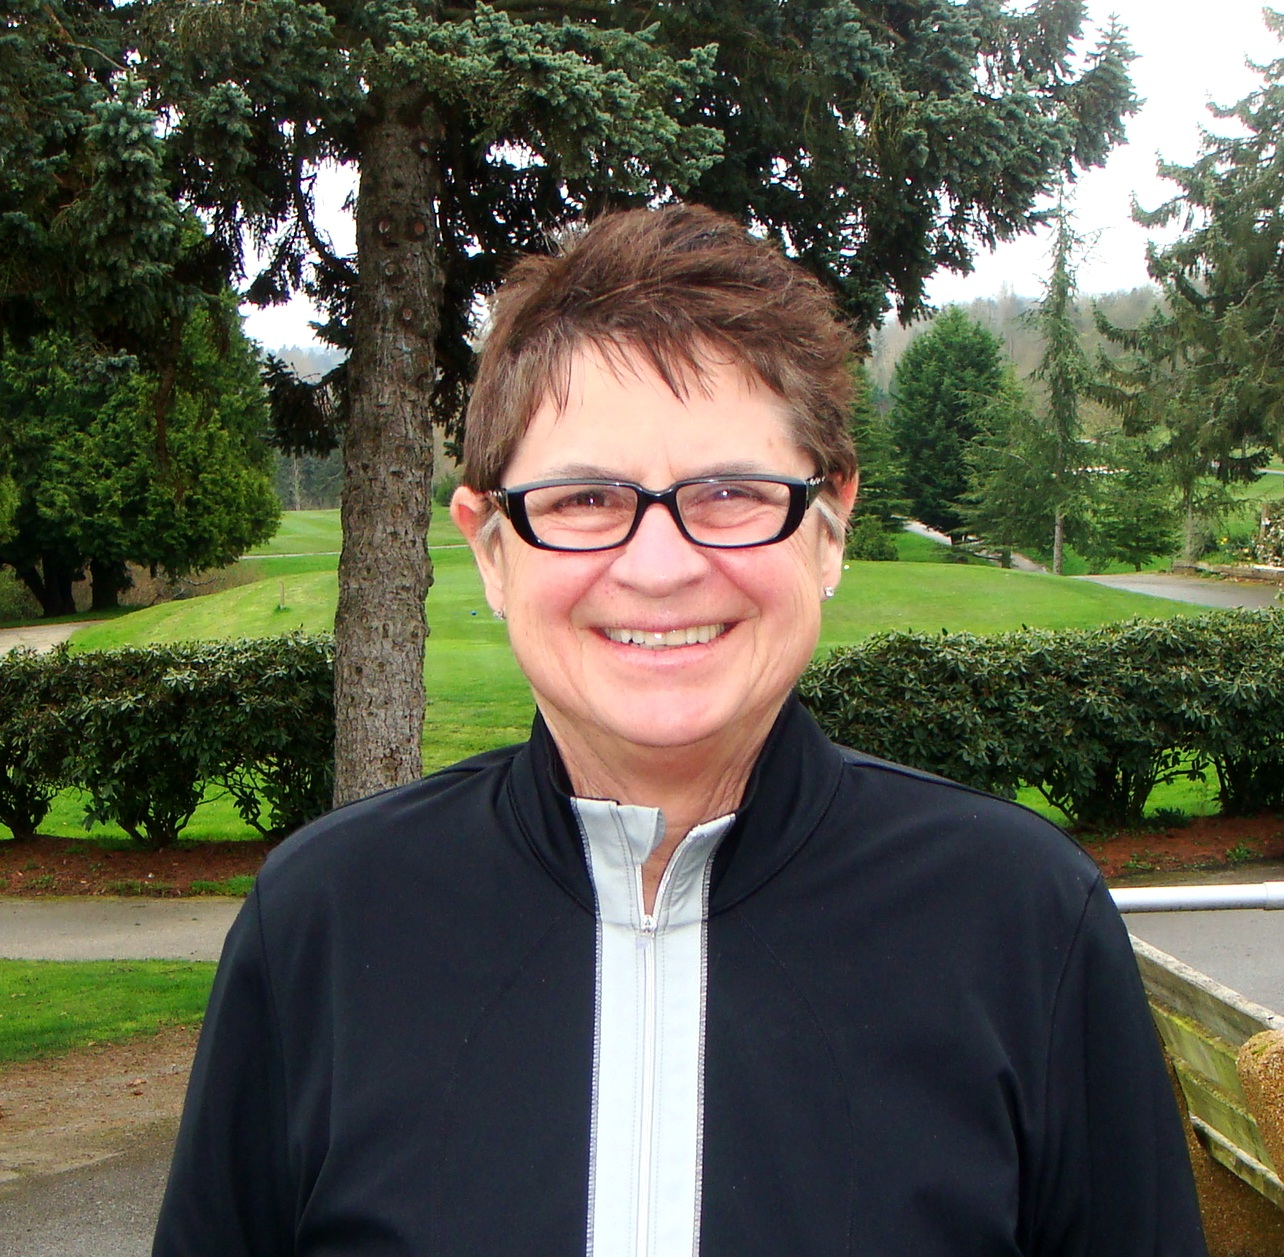 Barb Strecker